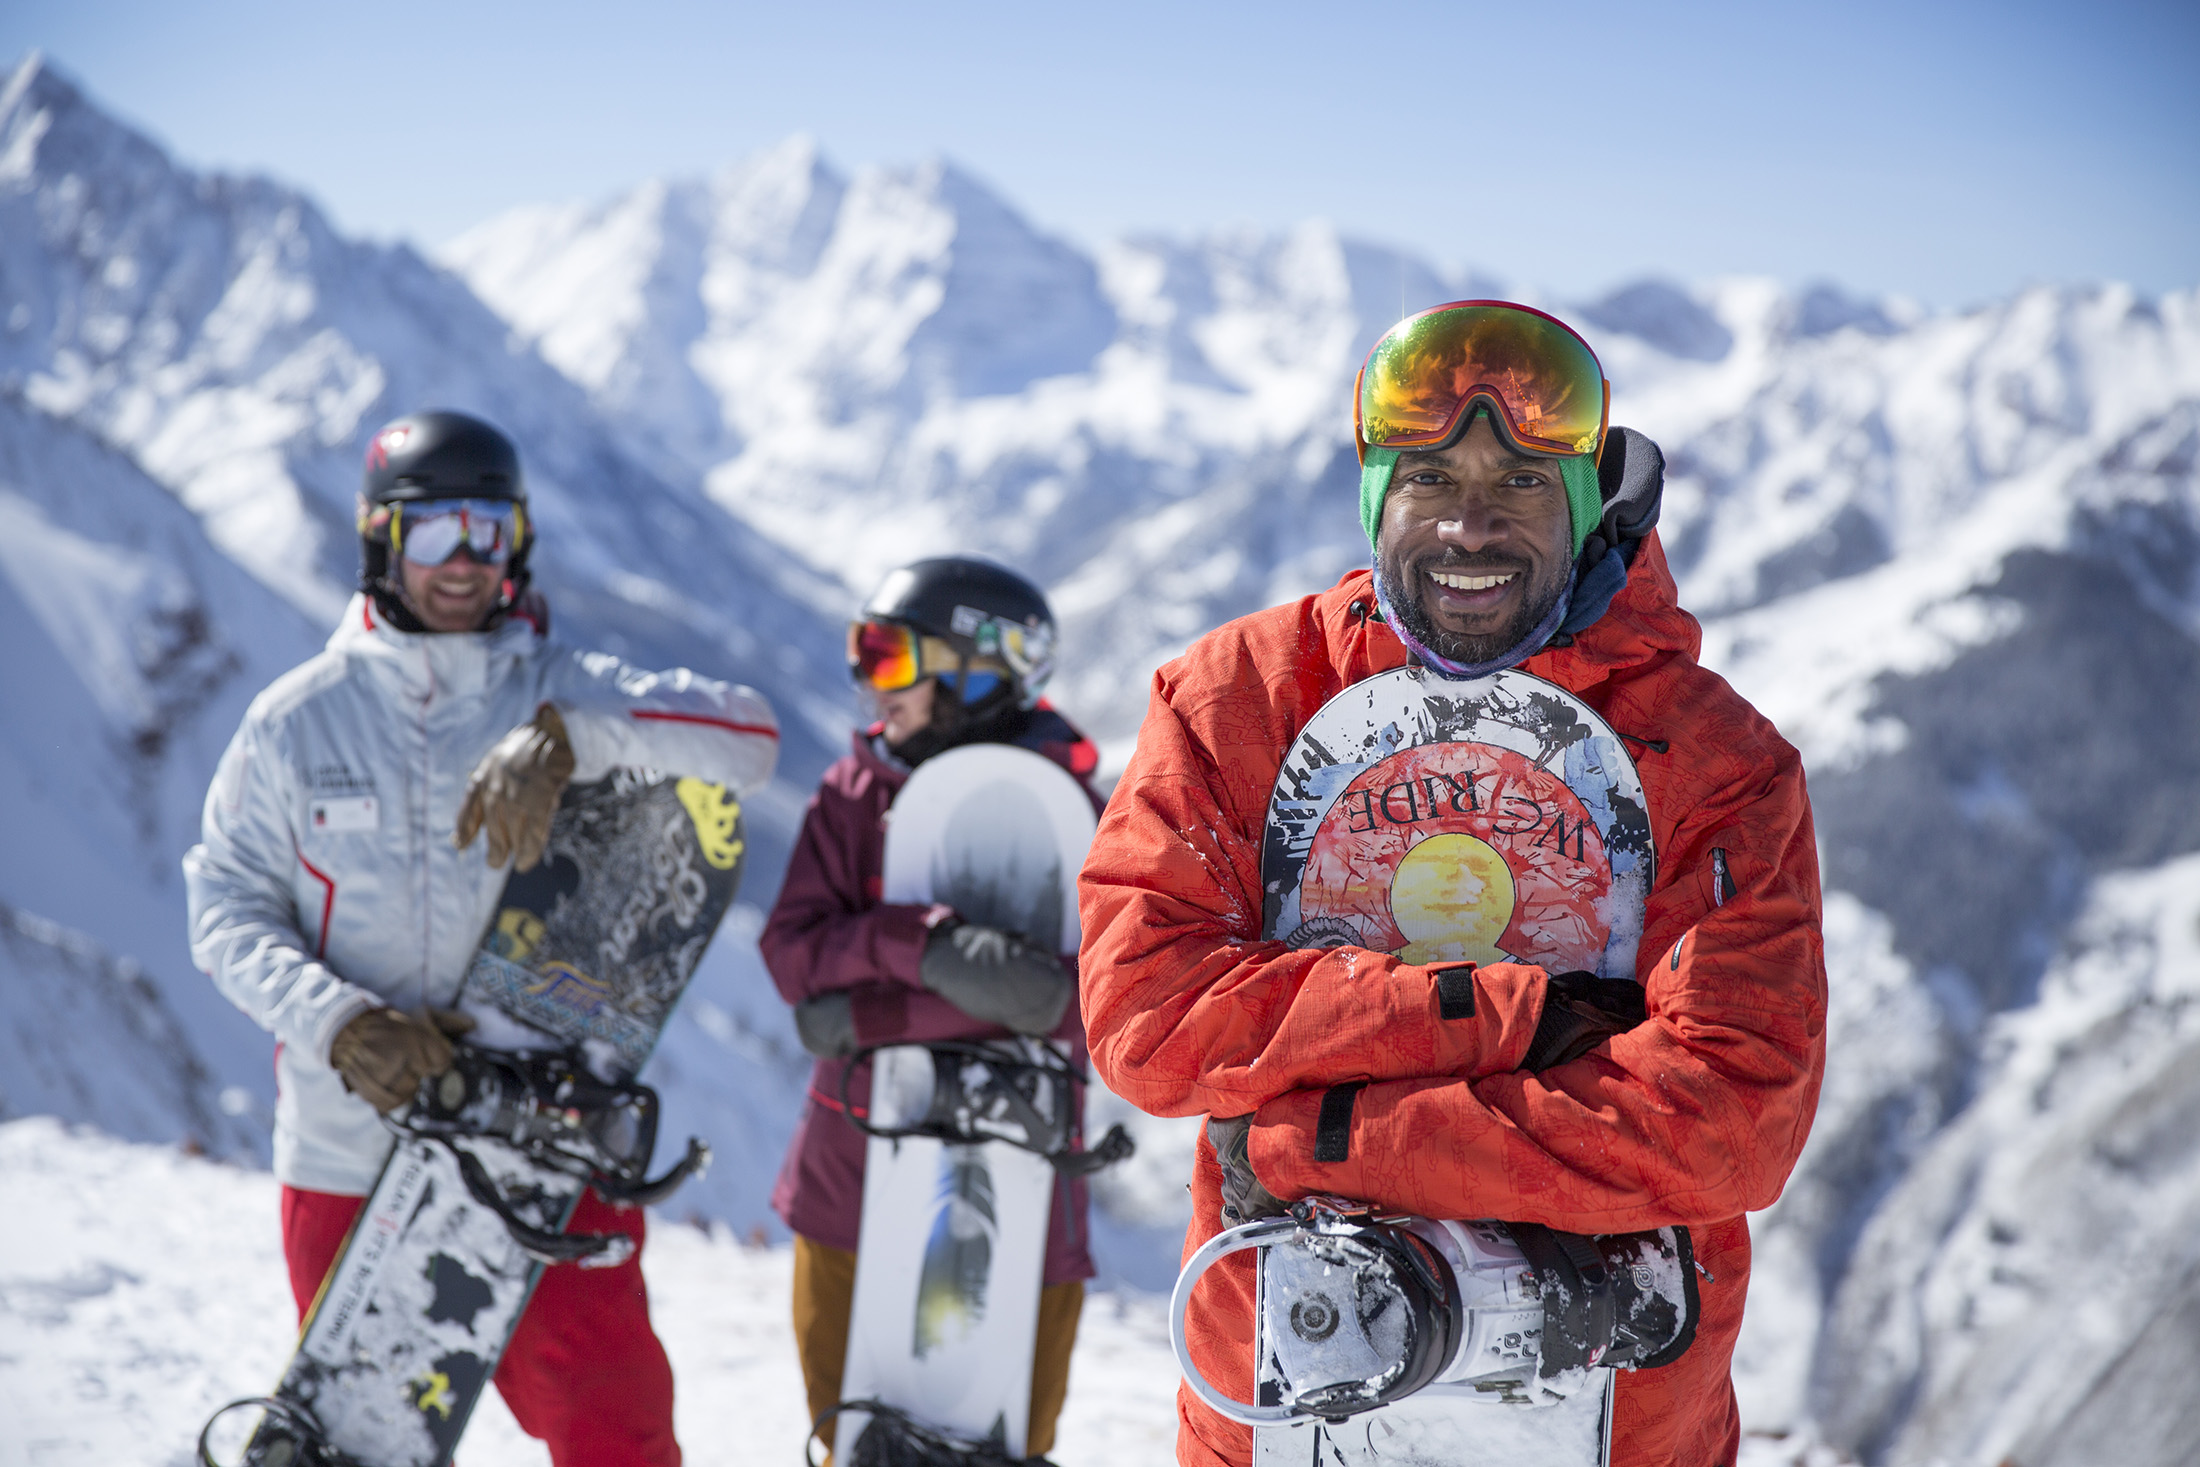 3 snowboarders in Aspen, Colorado